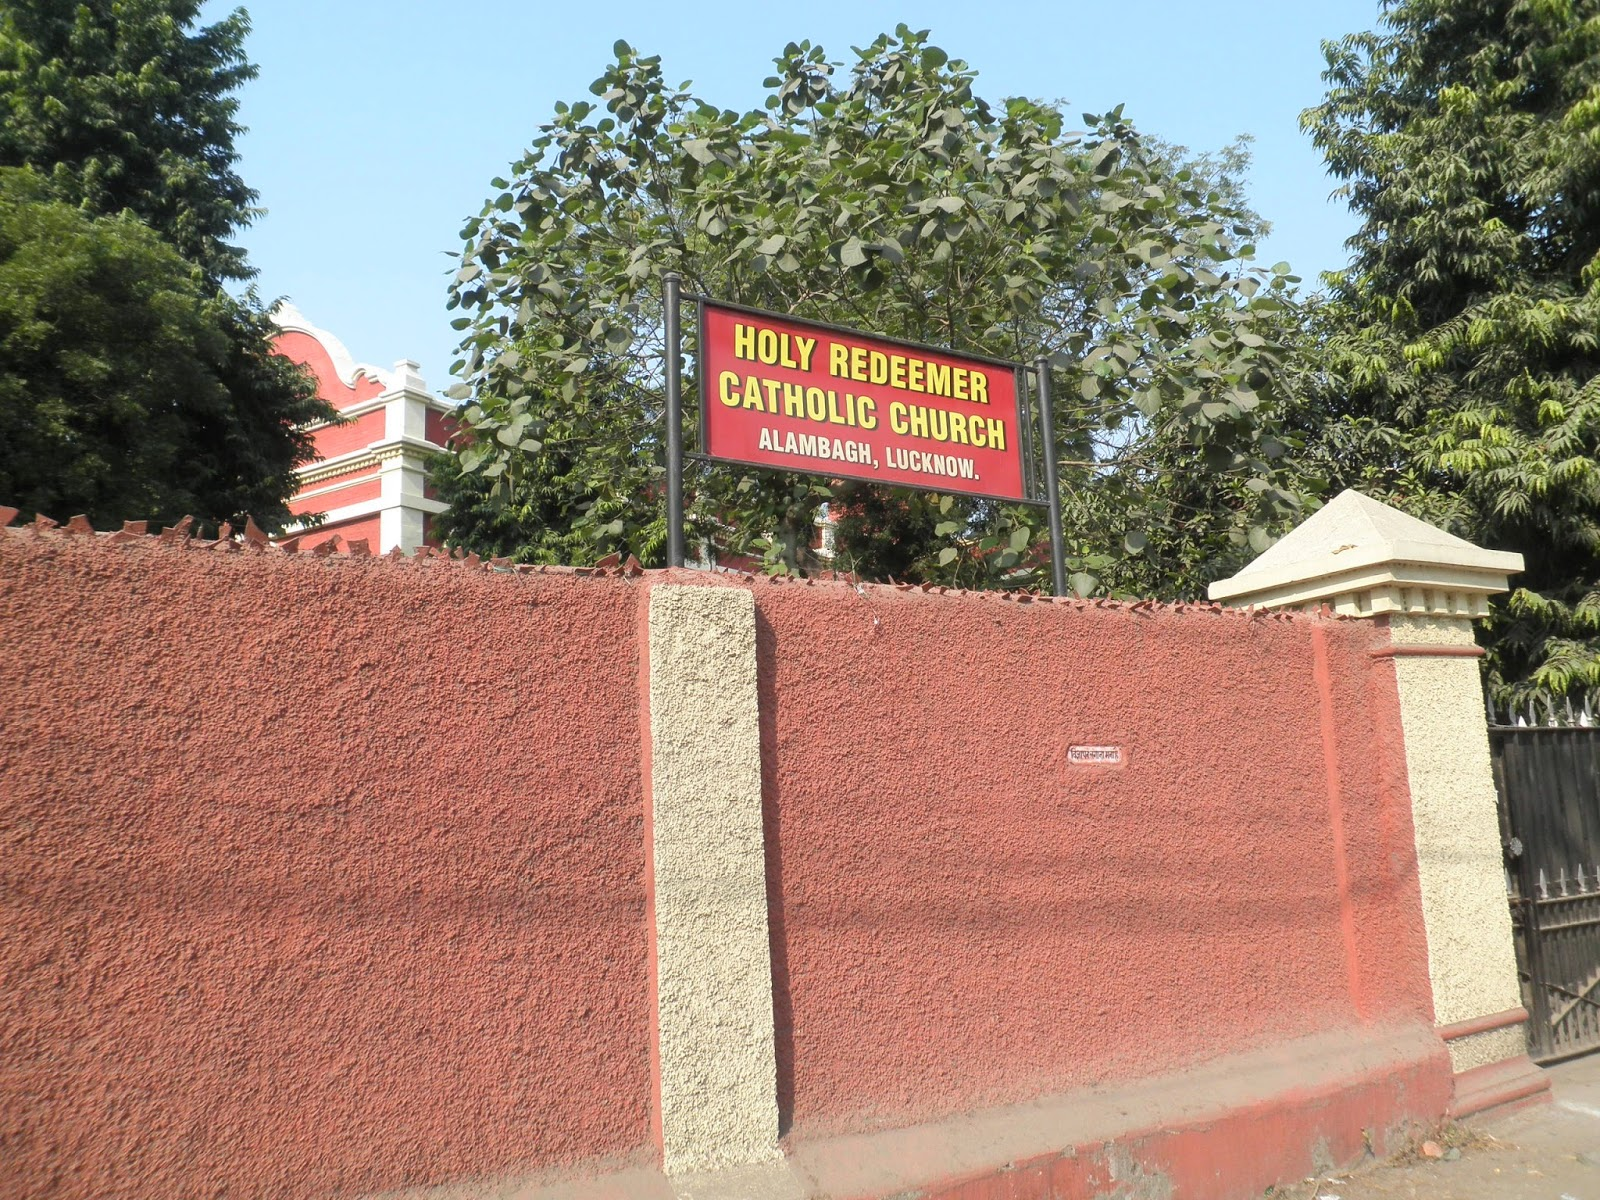 Colonial Lucknow: Holy Redeemer Church (Roman Catholic